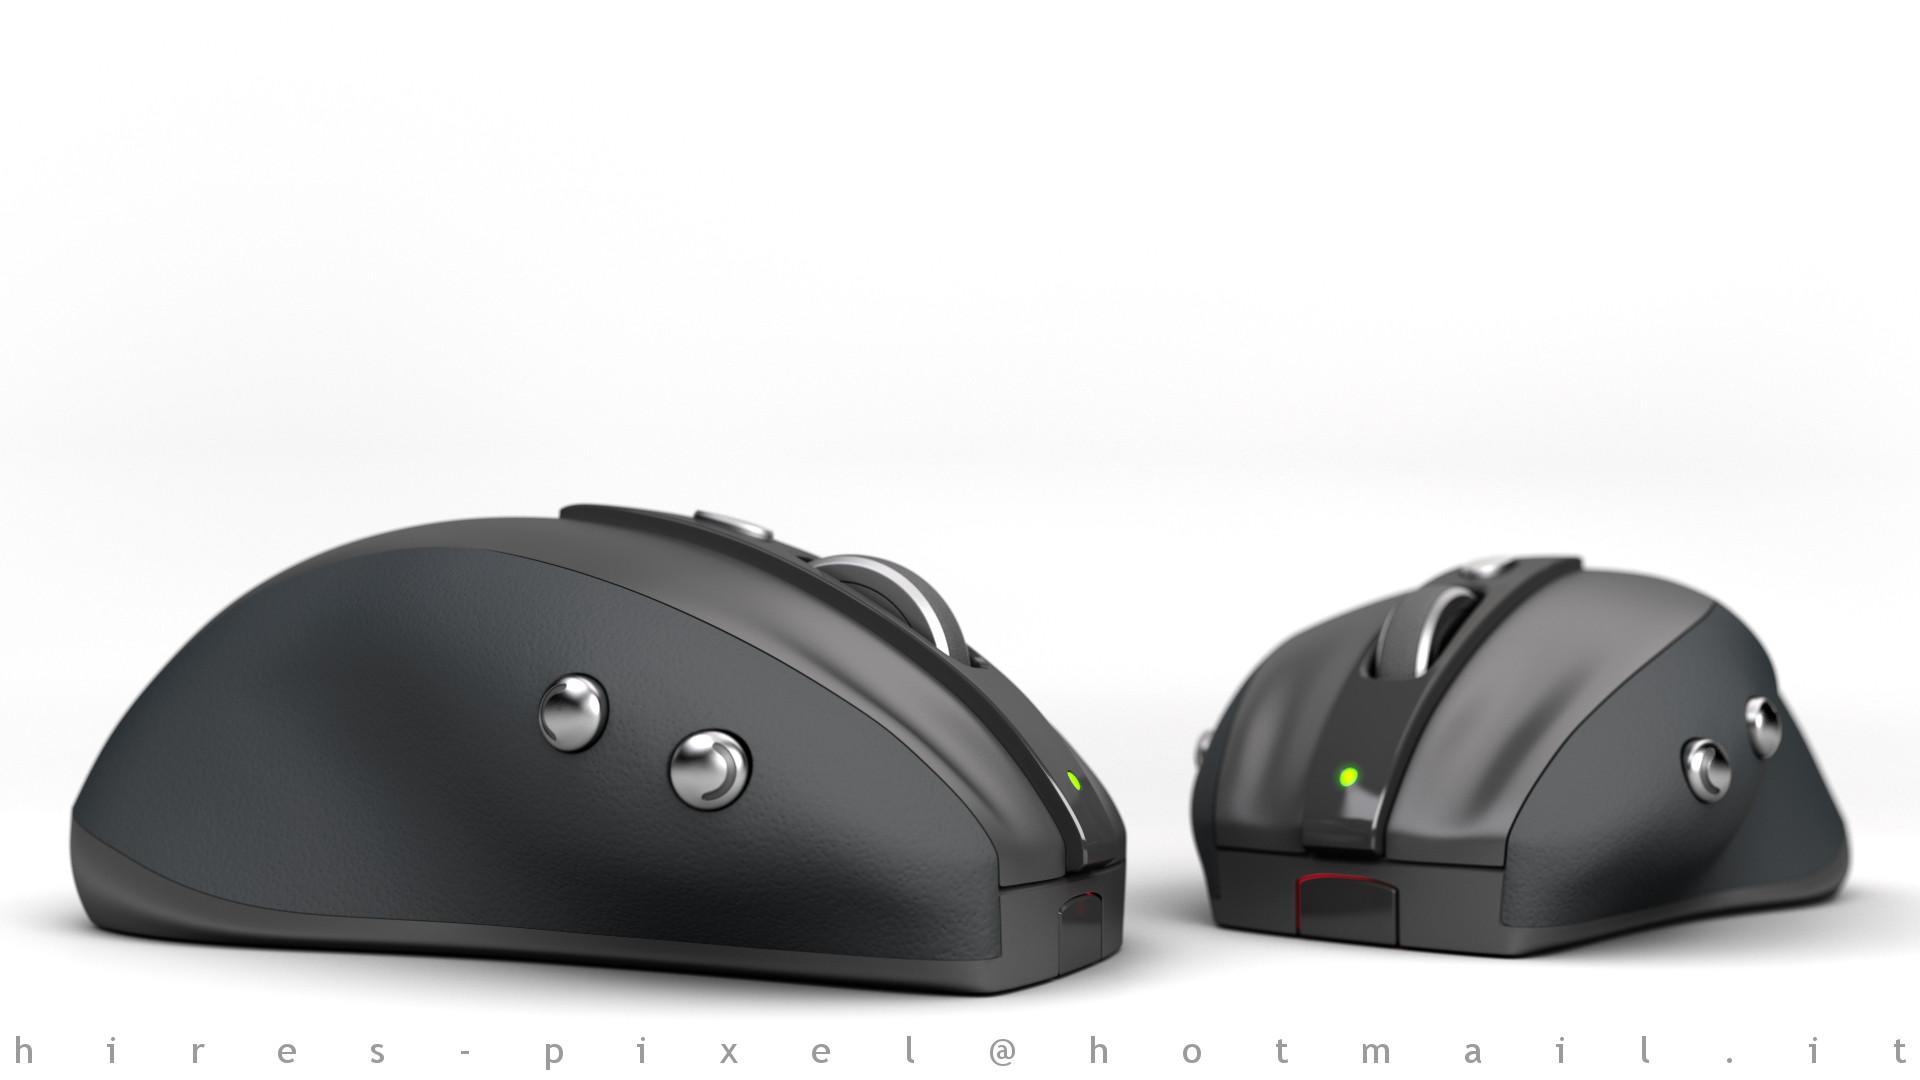 Mouse-fin.jpg